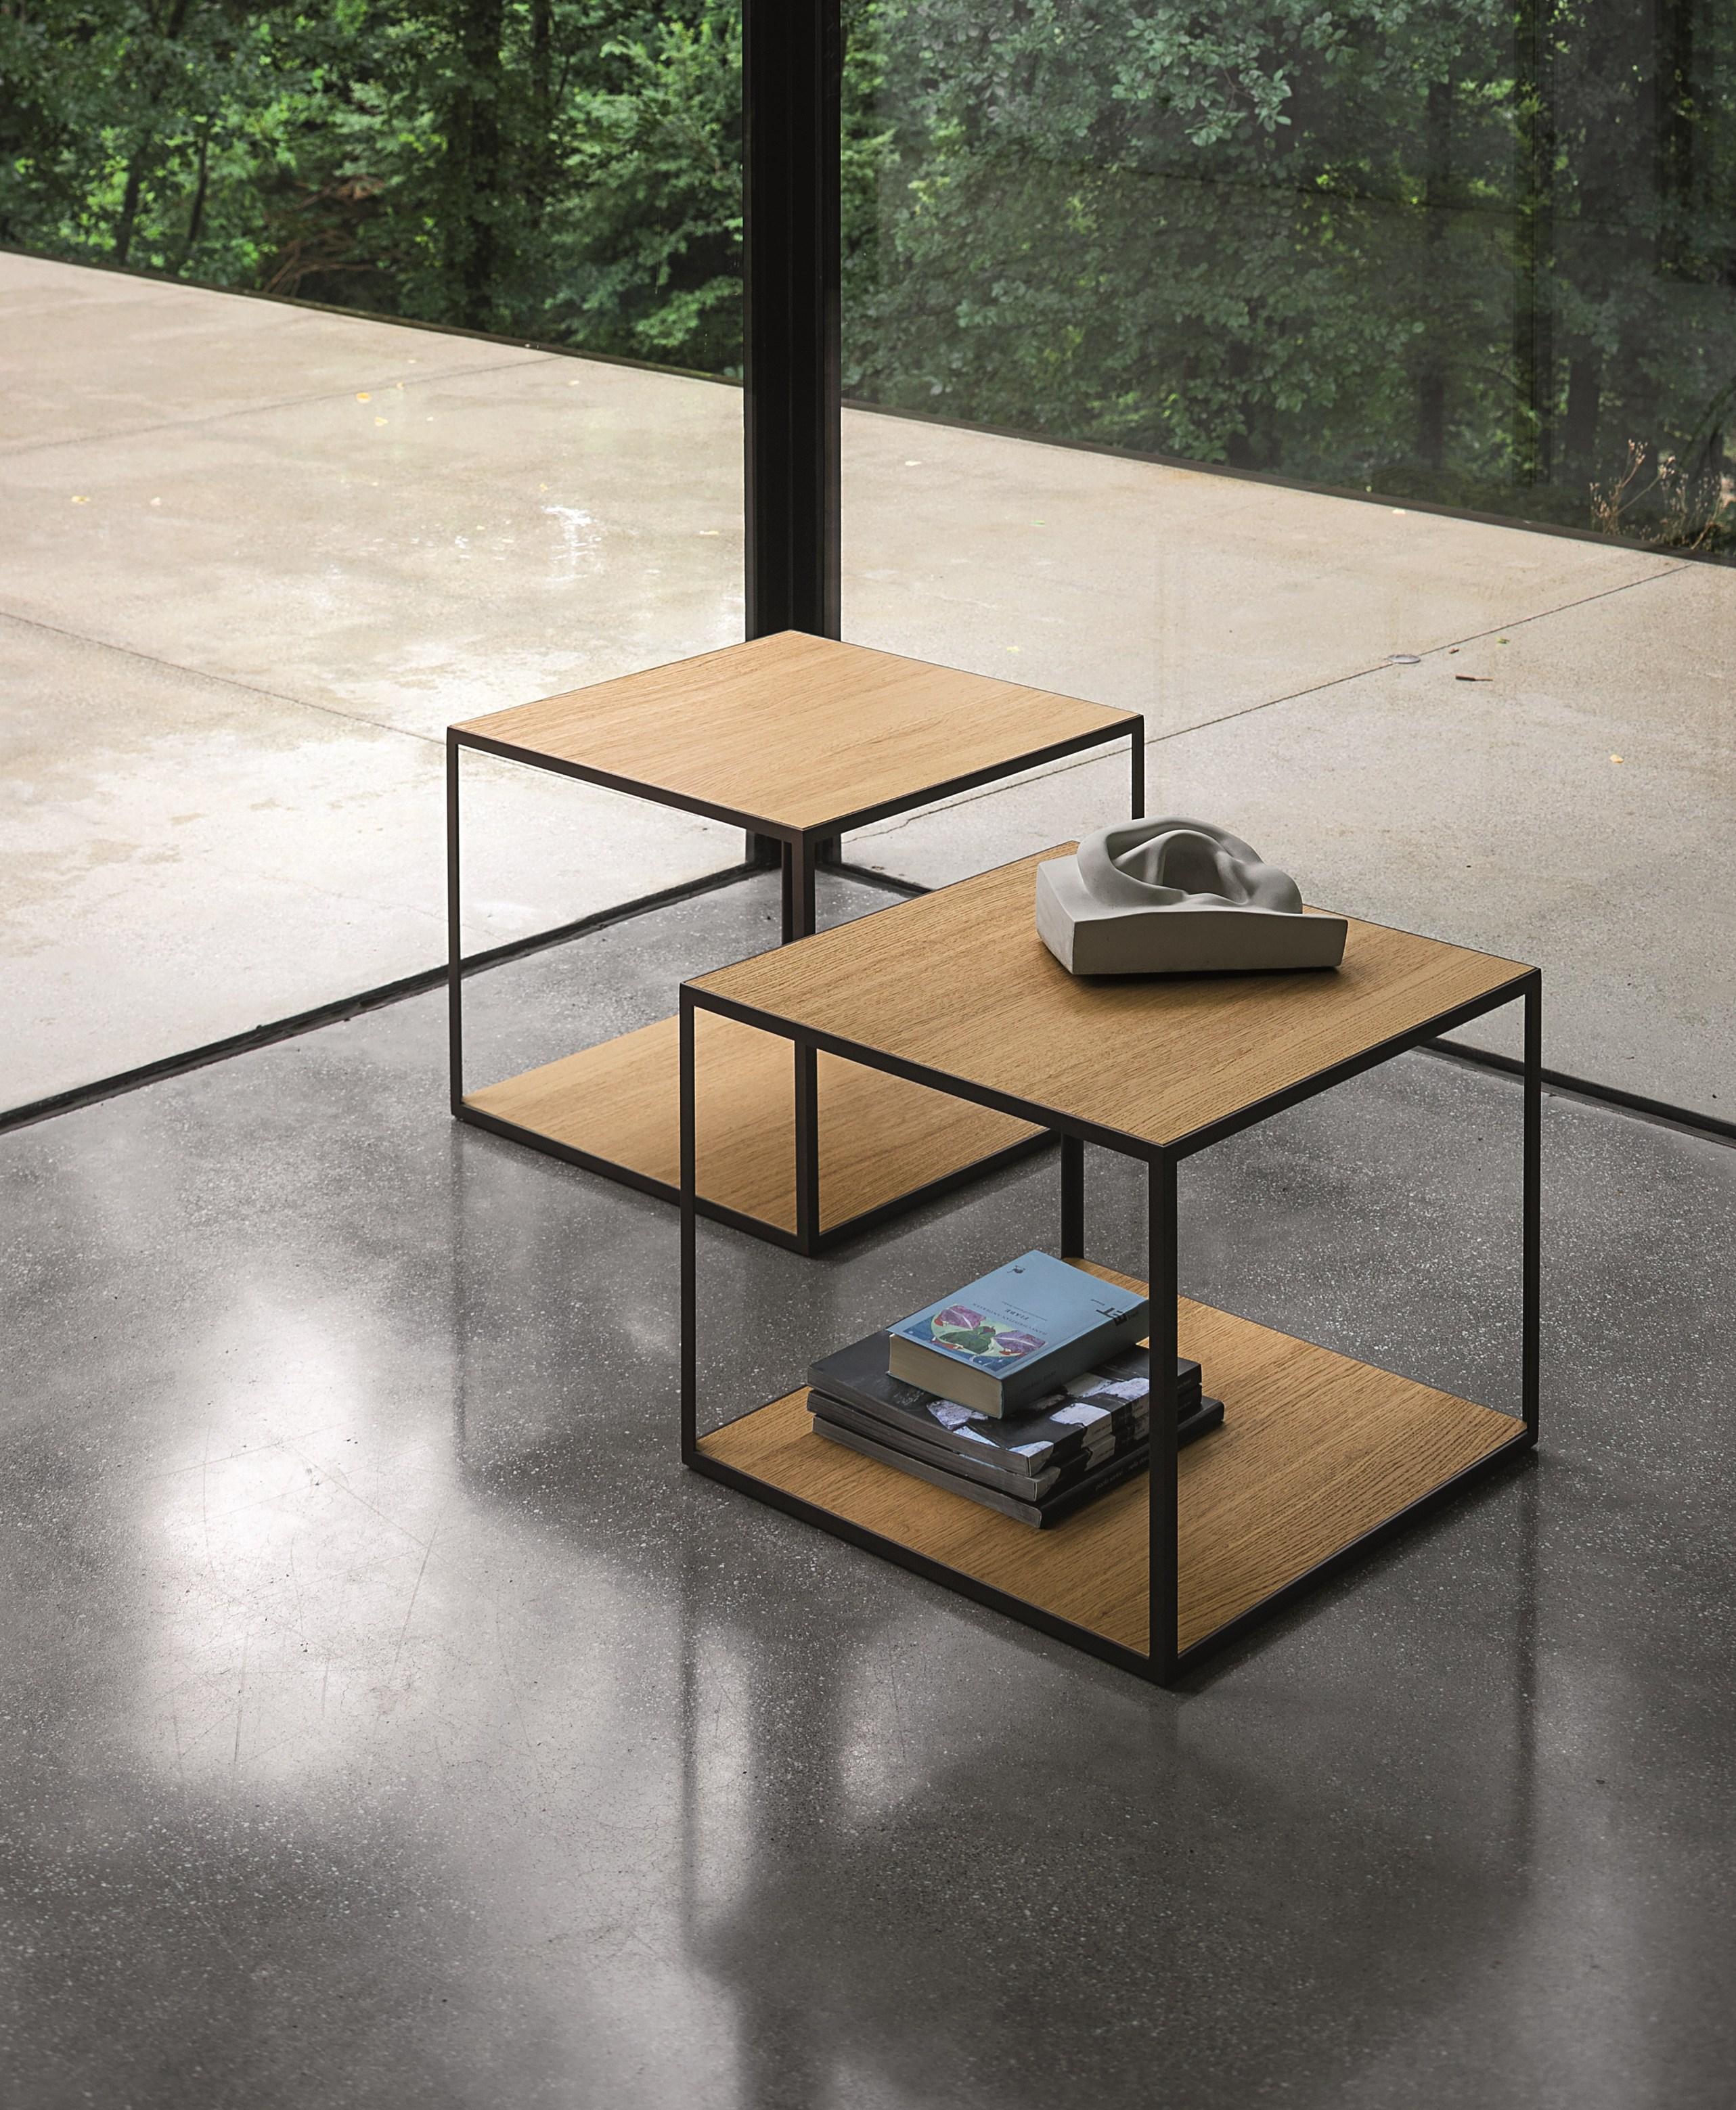 Tavolino pitagora di dall 39 agnese design imago design for Imago design